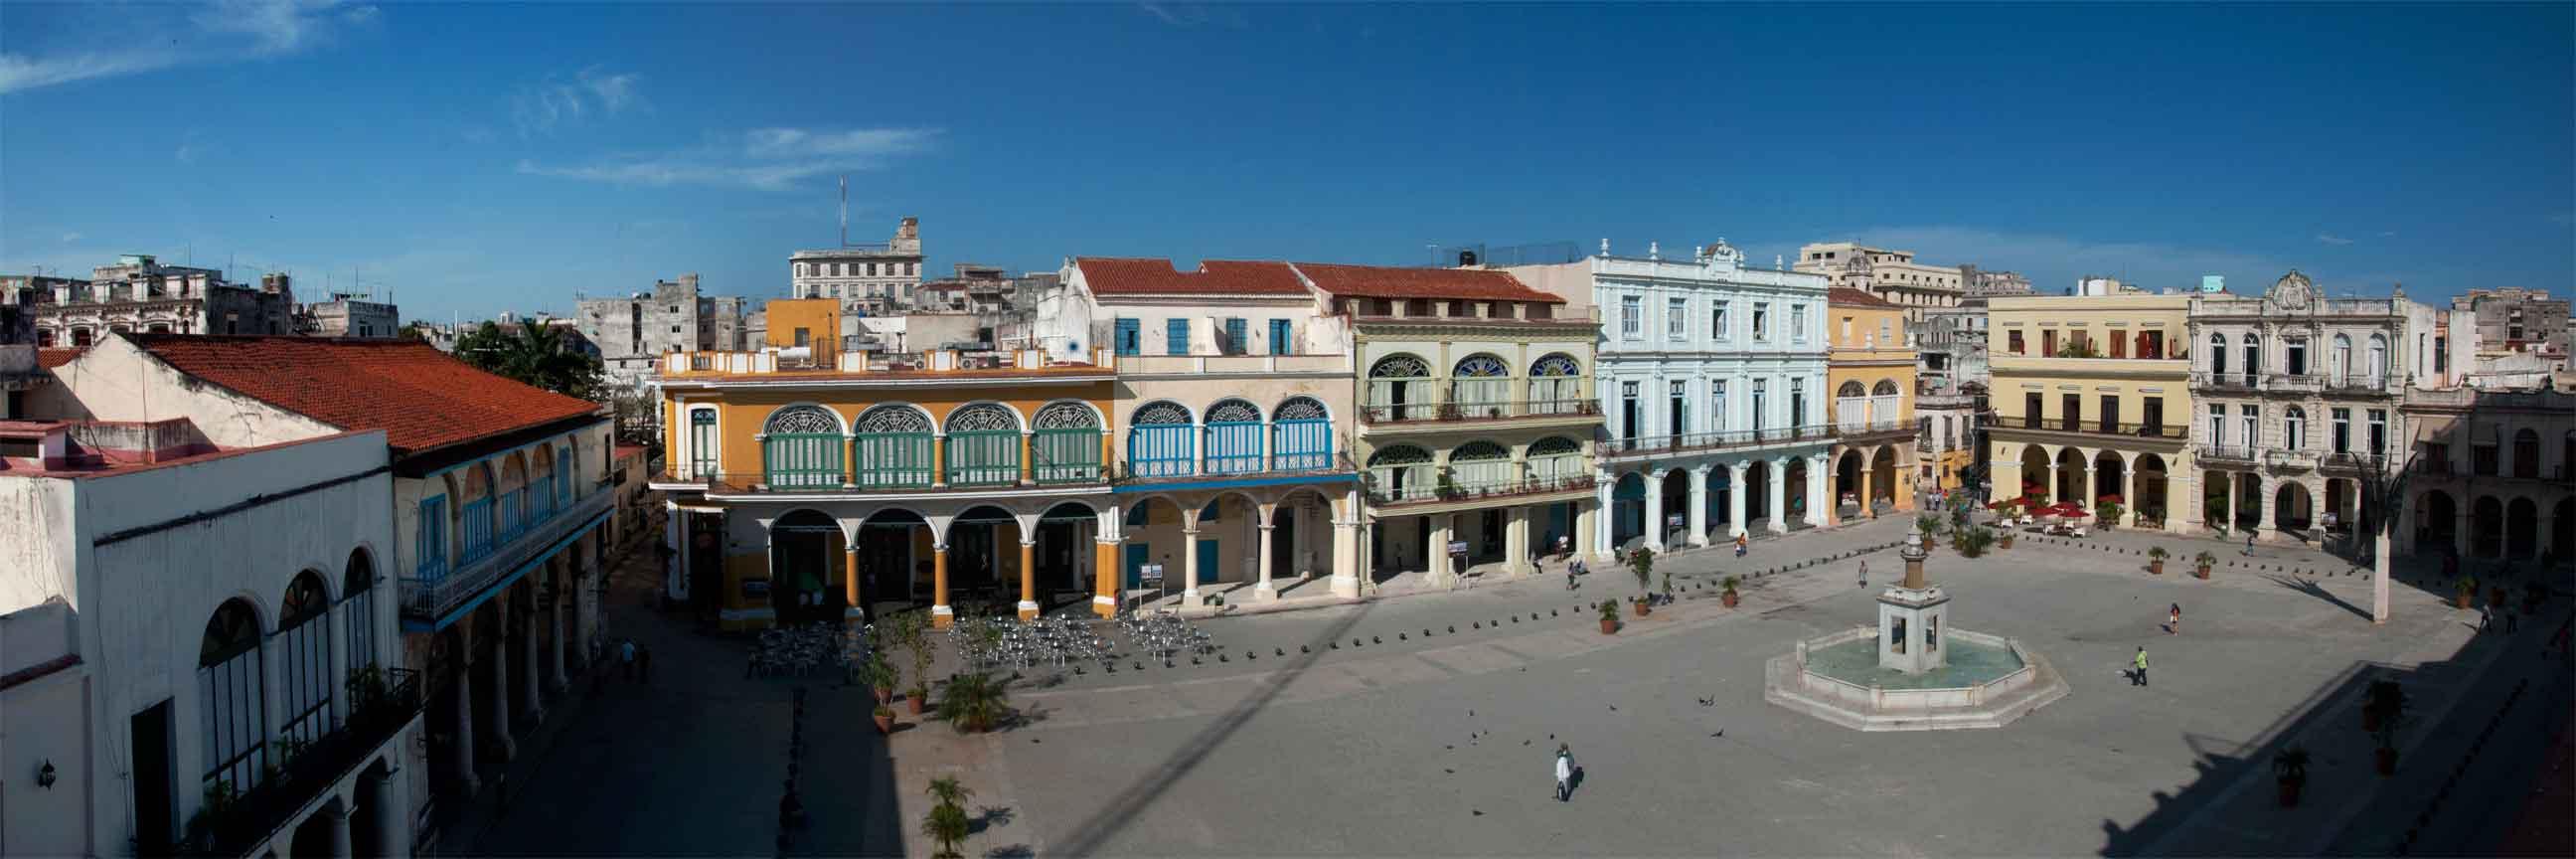 Plaza Vieja. Habana